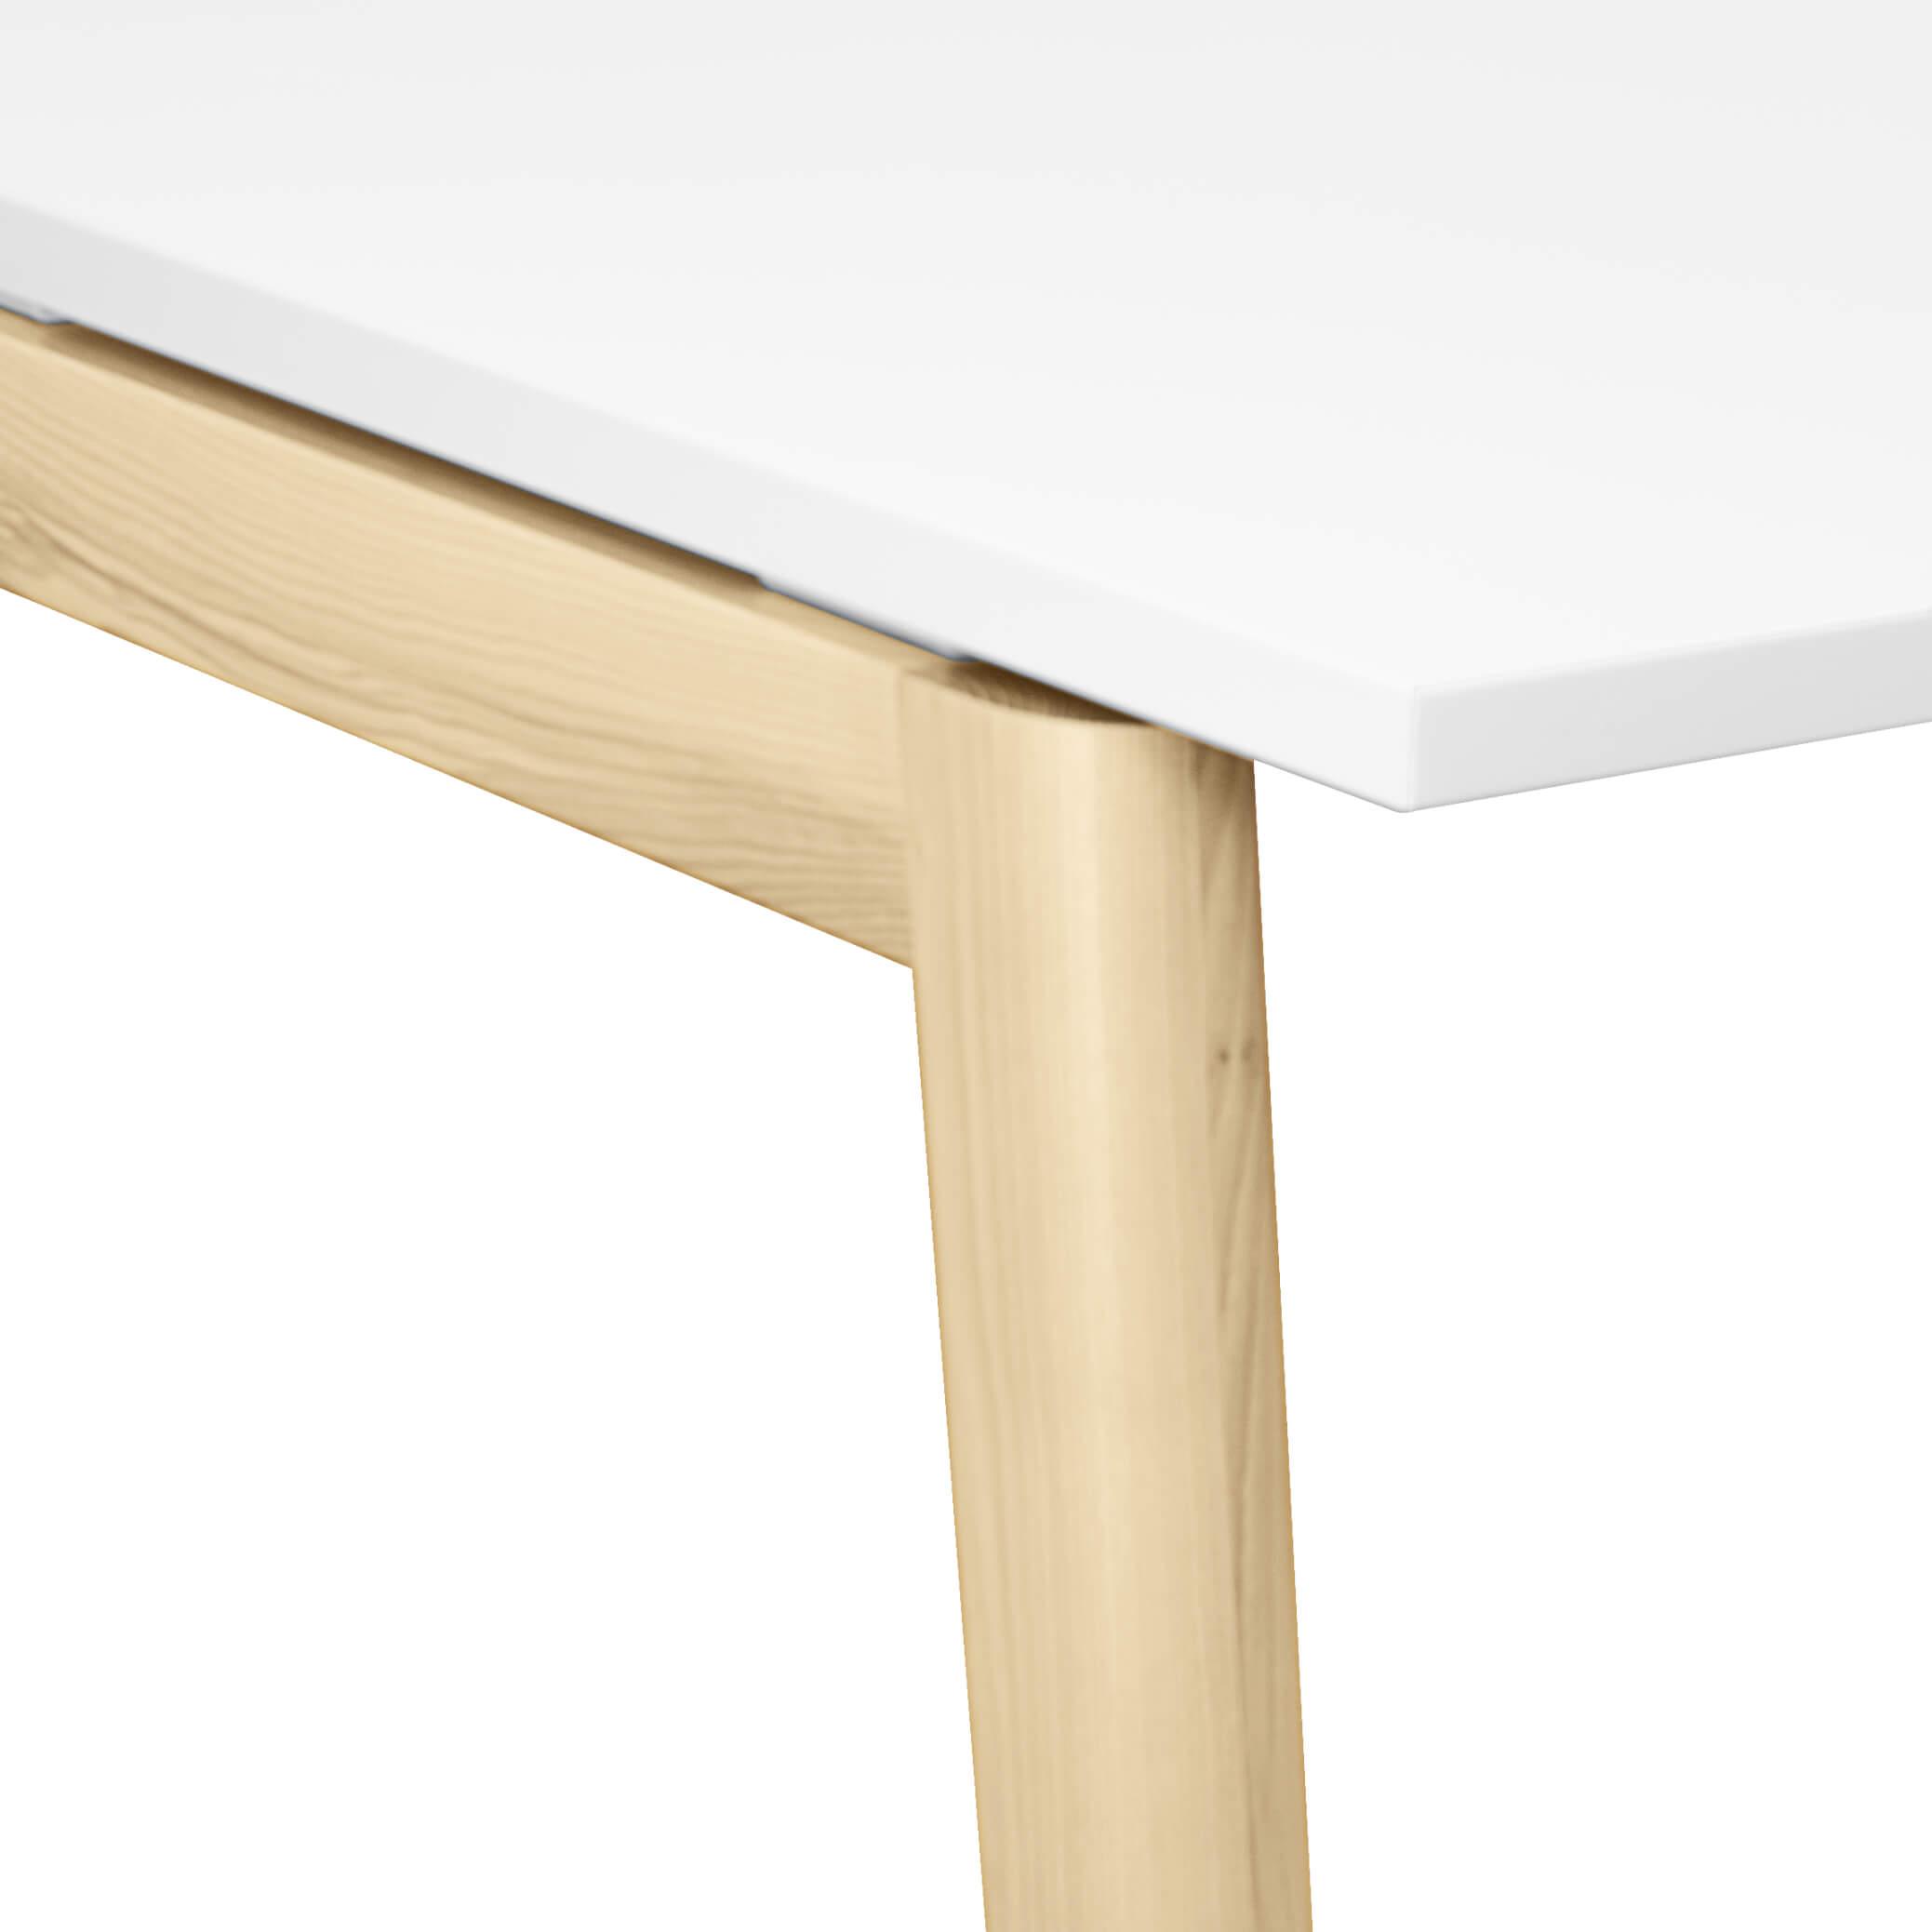 Konferenztisch NOVA Wood 180 x 120 cm Weiß/Holz Meeting Bürotisch